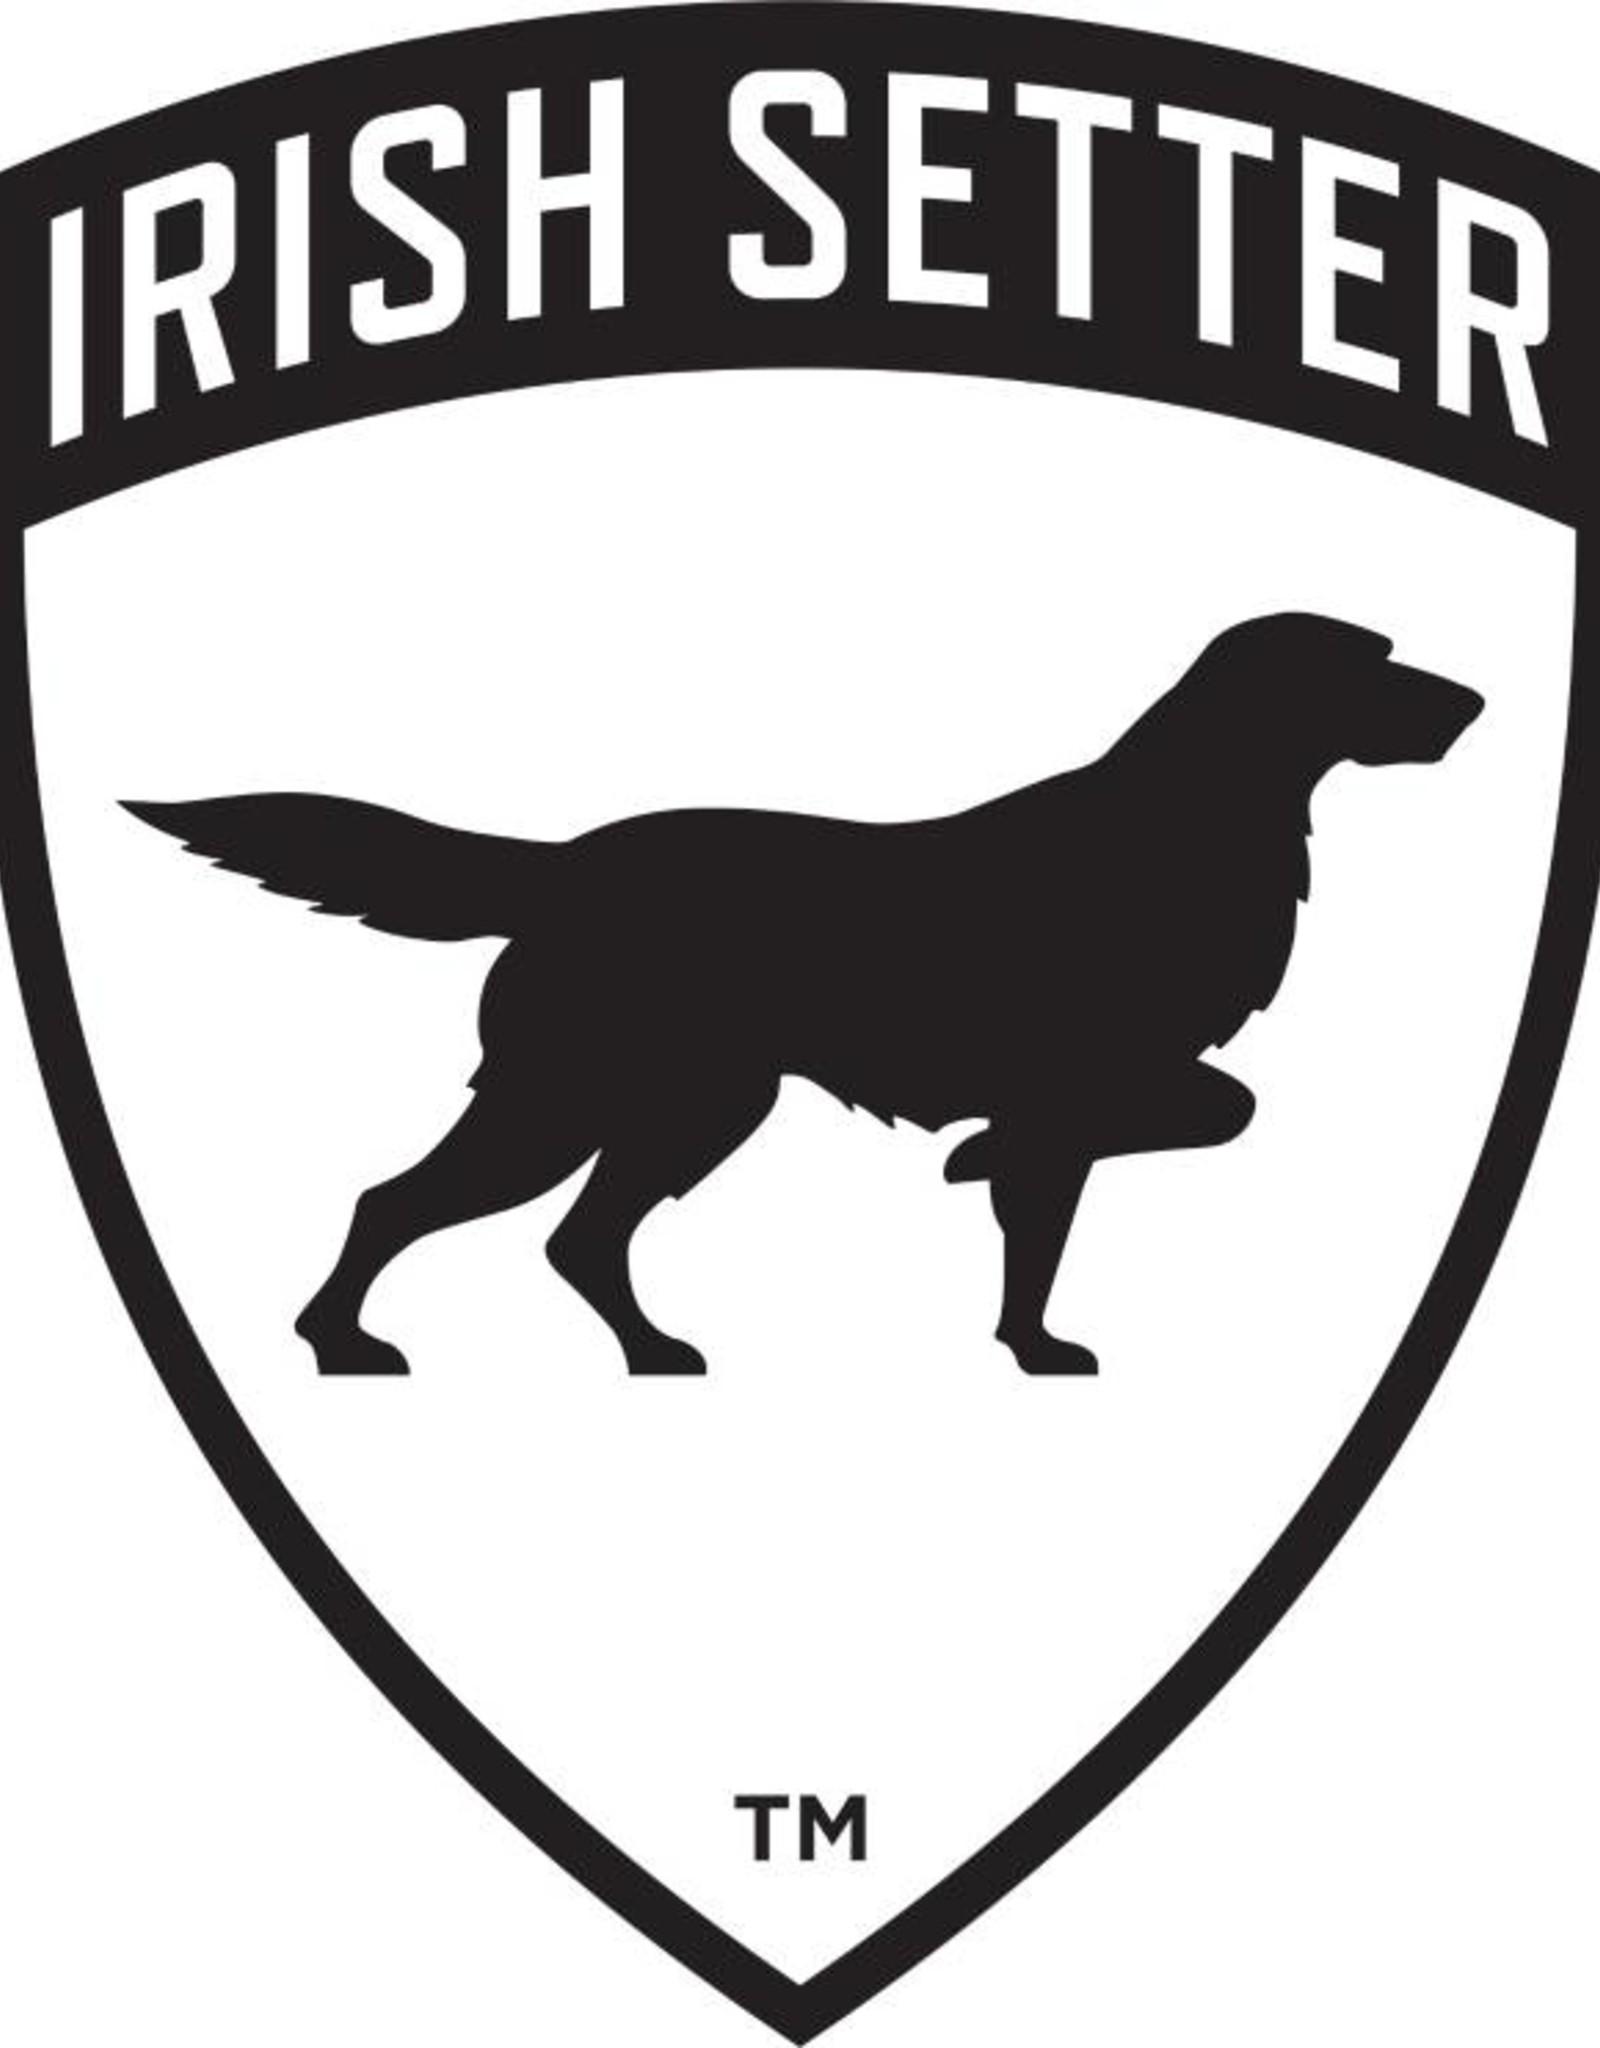 Redwing Irish Setter 867 Trailblazer